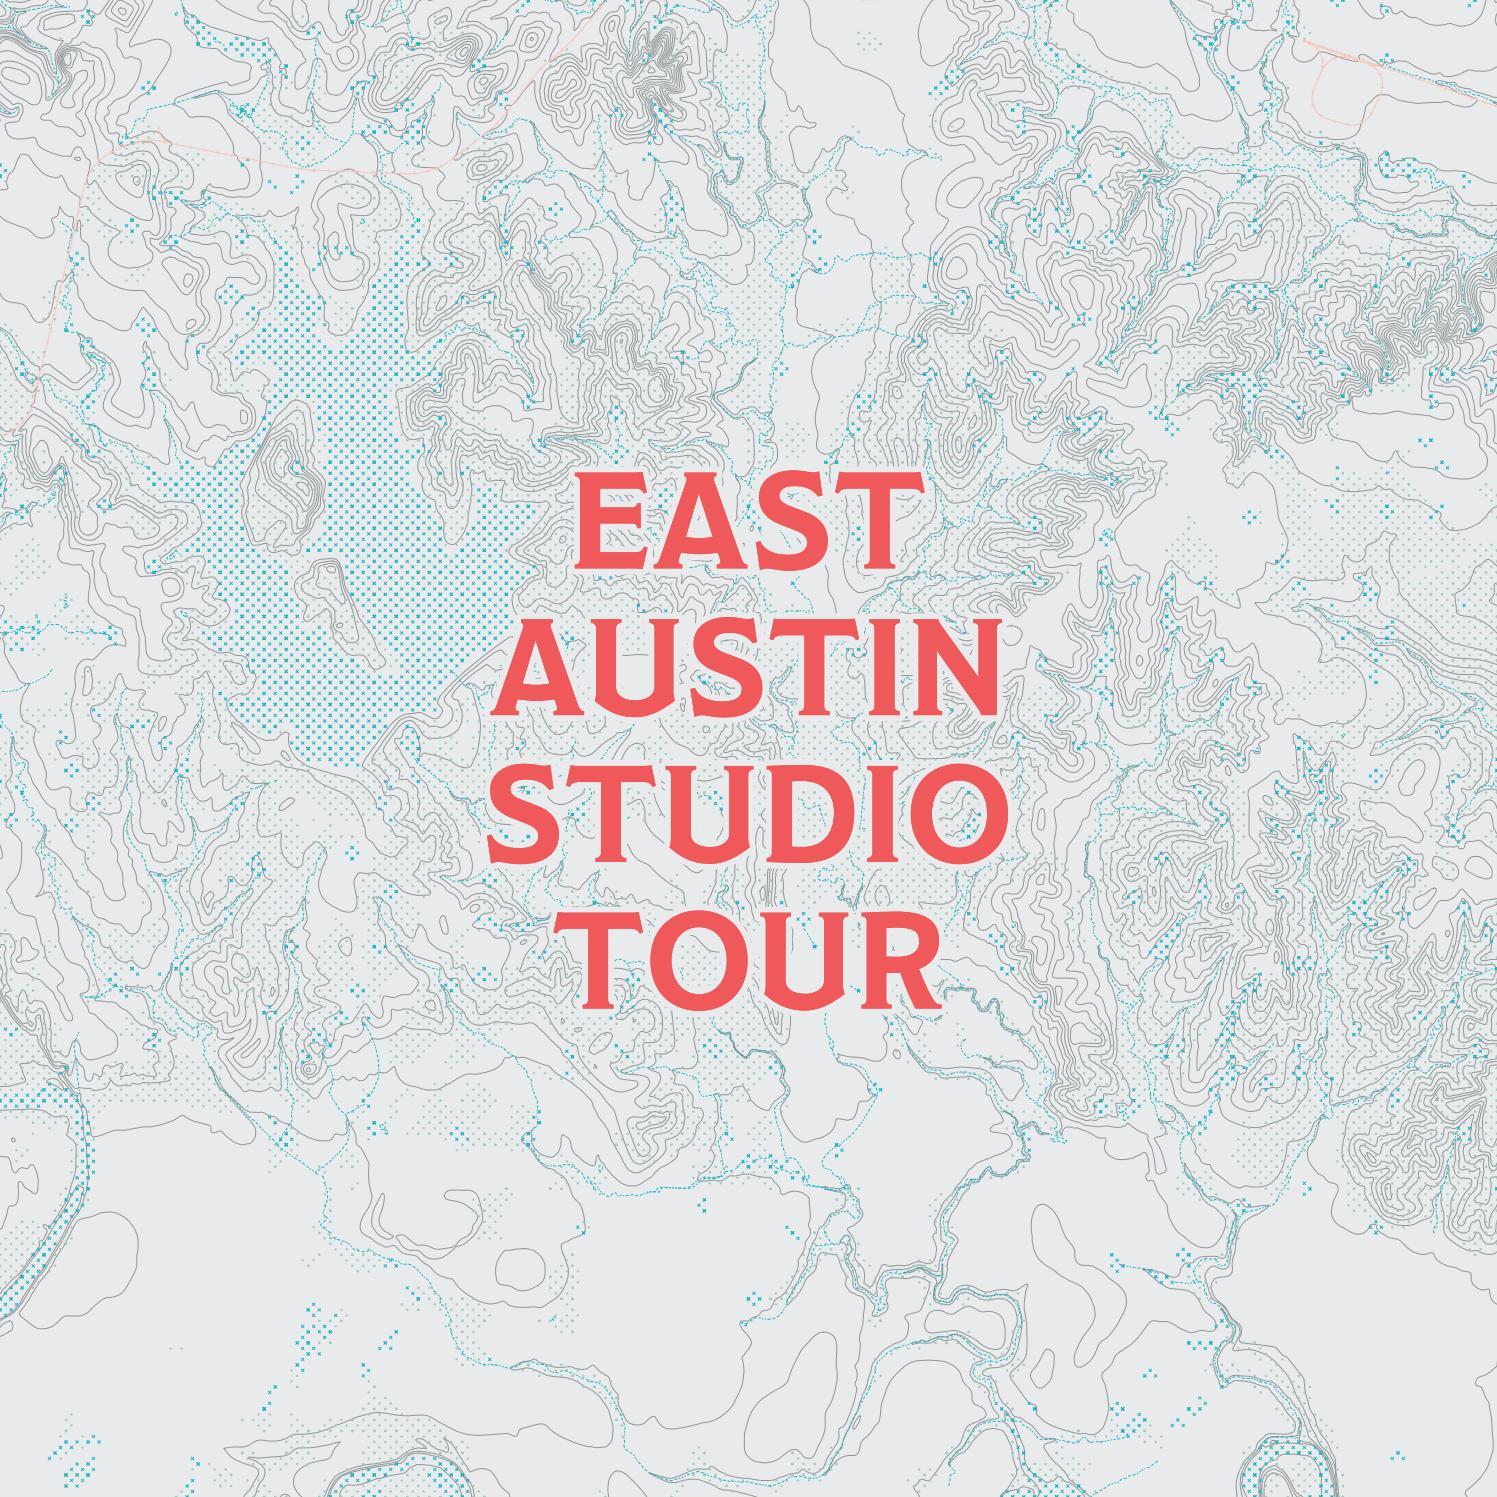 East Austin Studio Tour 2019 By Big Medium Issuu